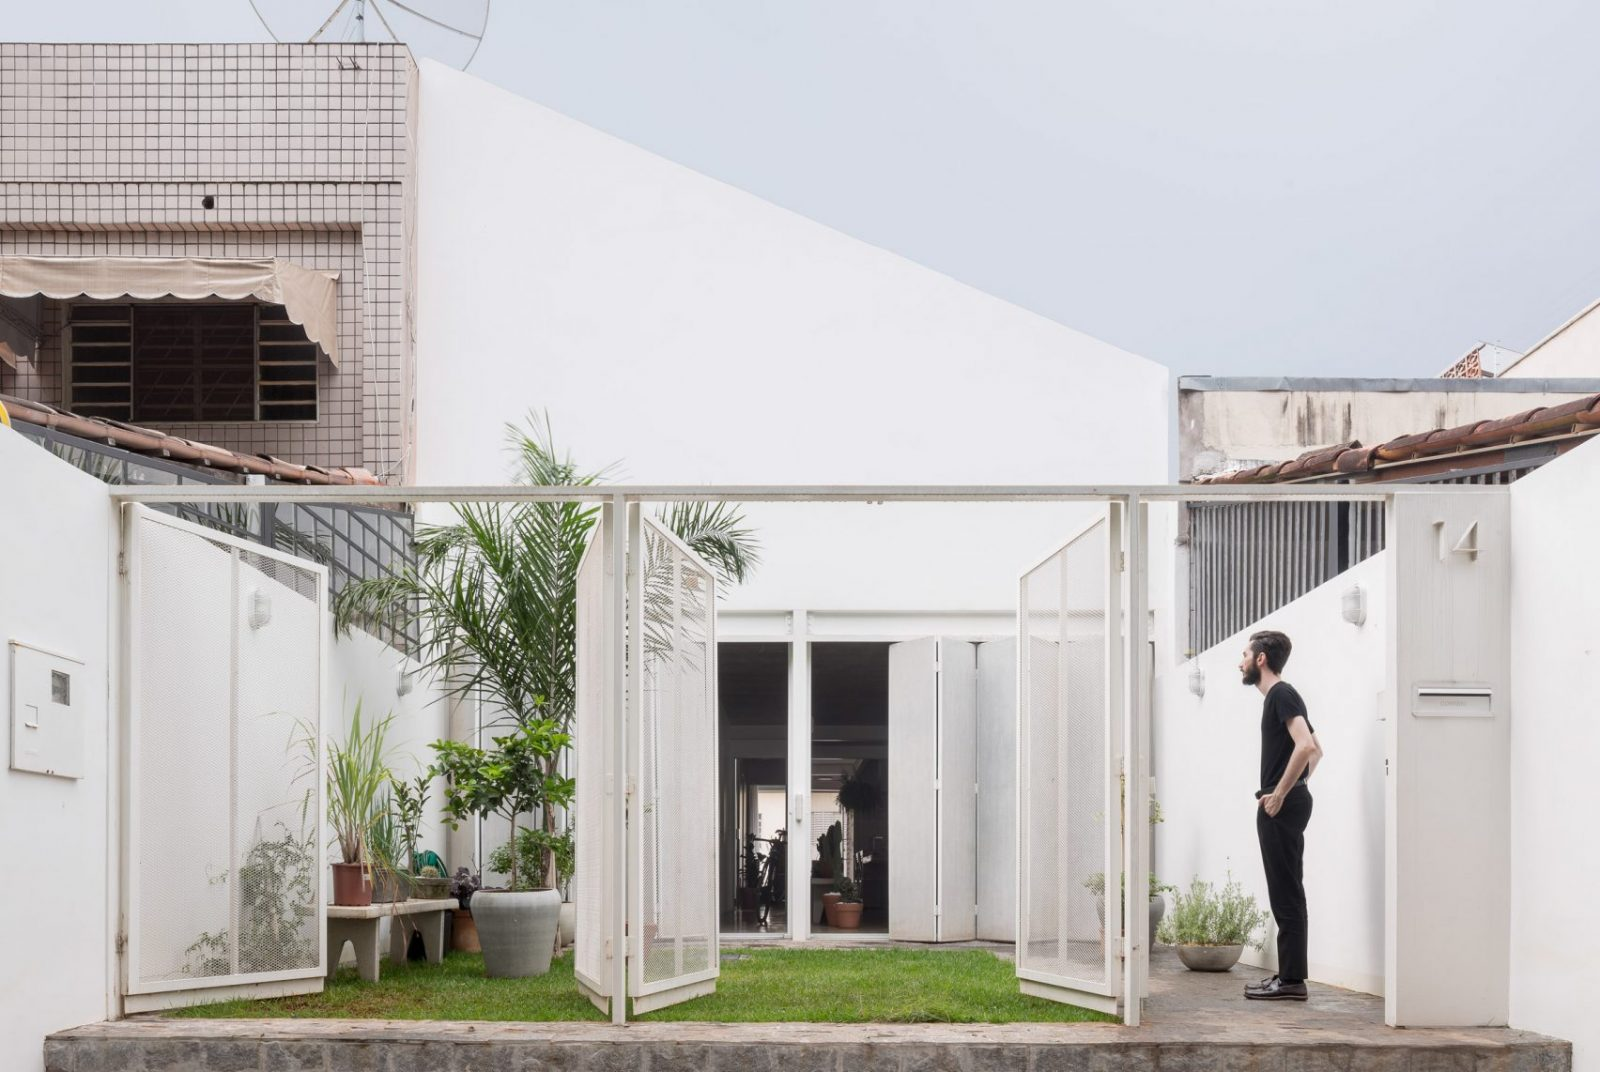 casa-711h-bloco-arquitetos-Joana-Franca-02-1600x1072